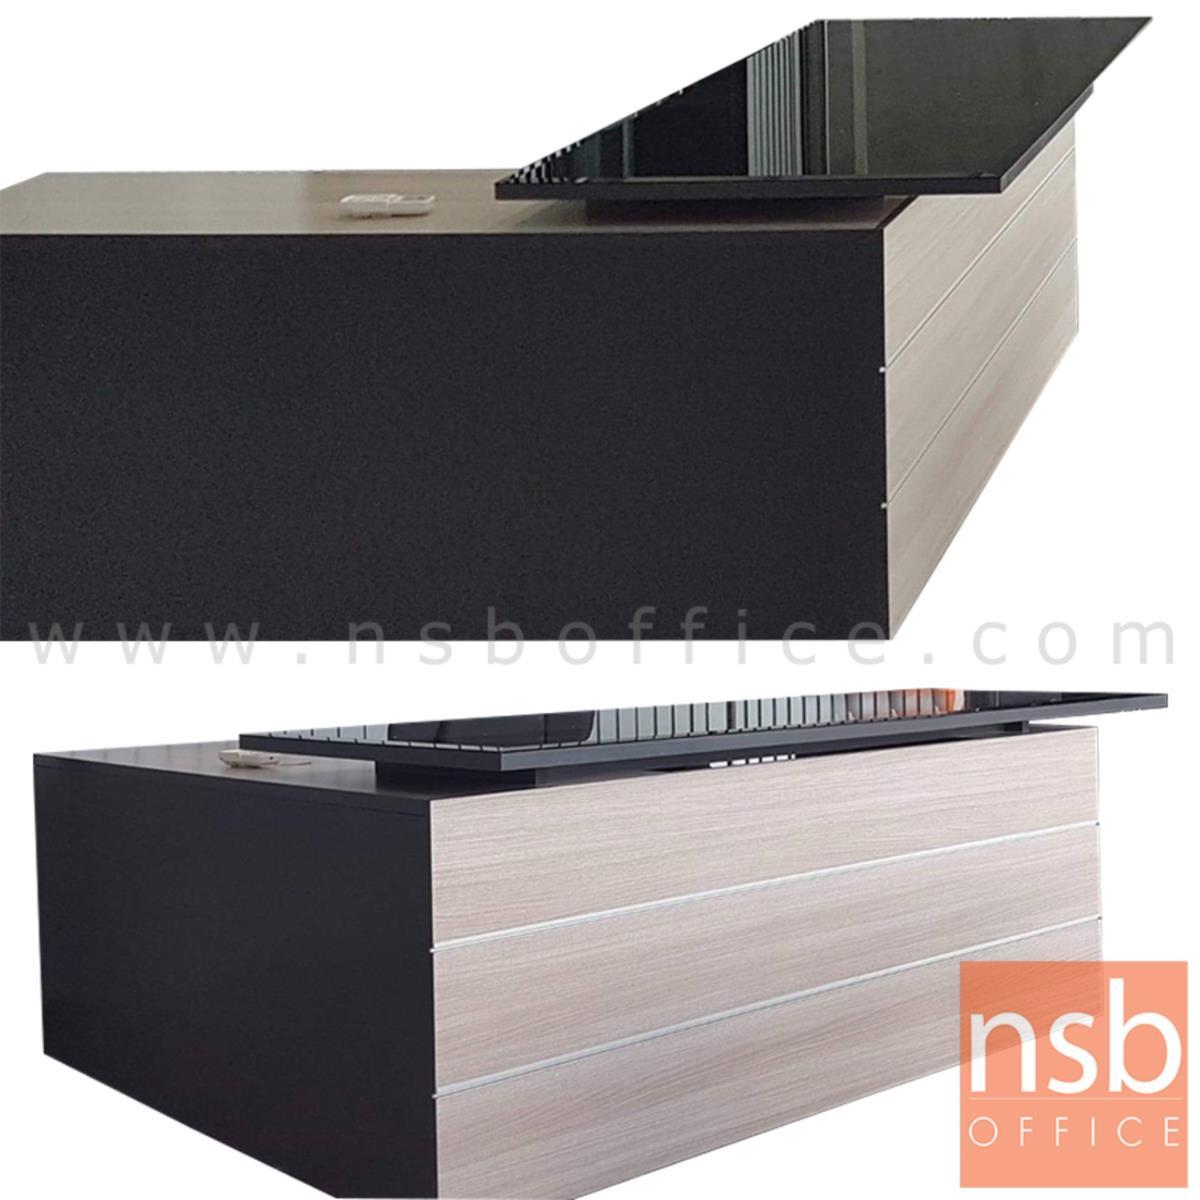 A16A083:โต๊ะทำงานตัวแอลหน้าท็อปกระจก รุ่น Cadillac (คาดิลแลค) ขนาด 180W cm.